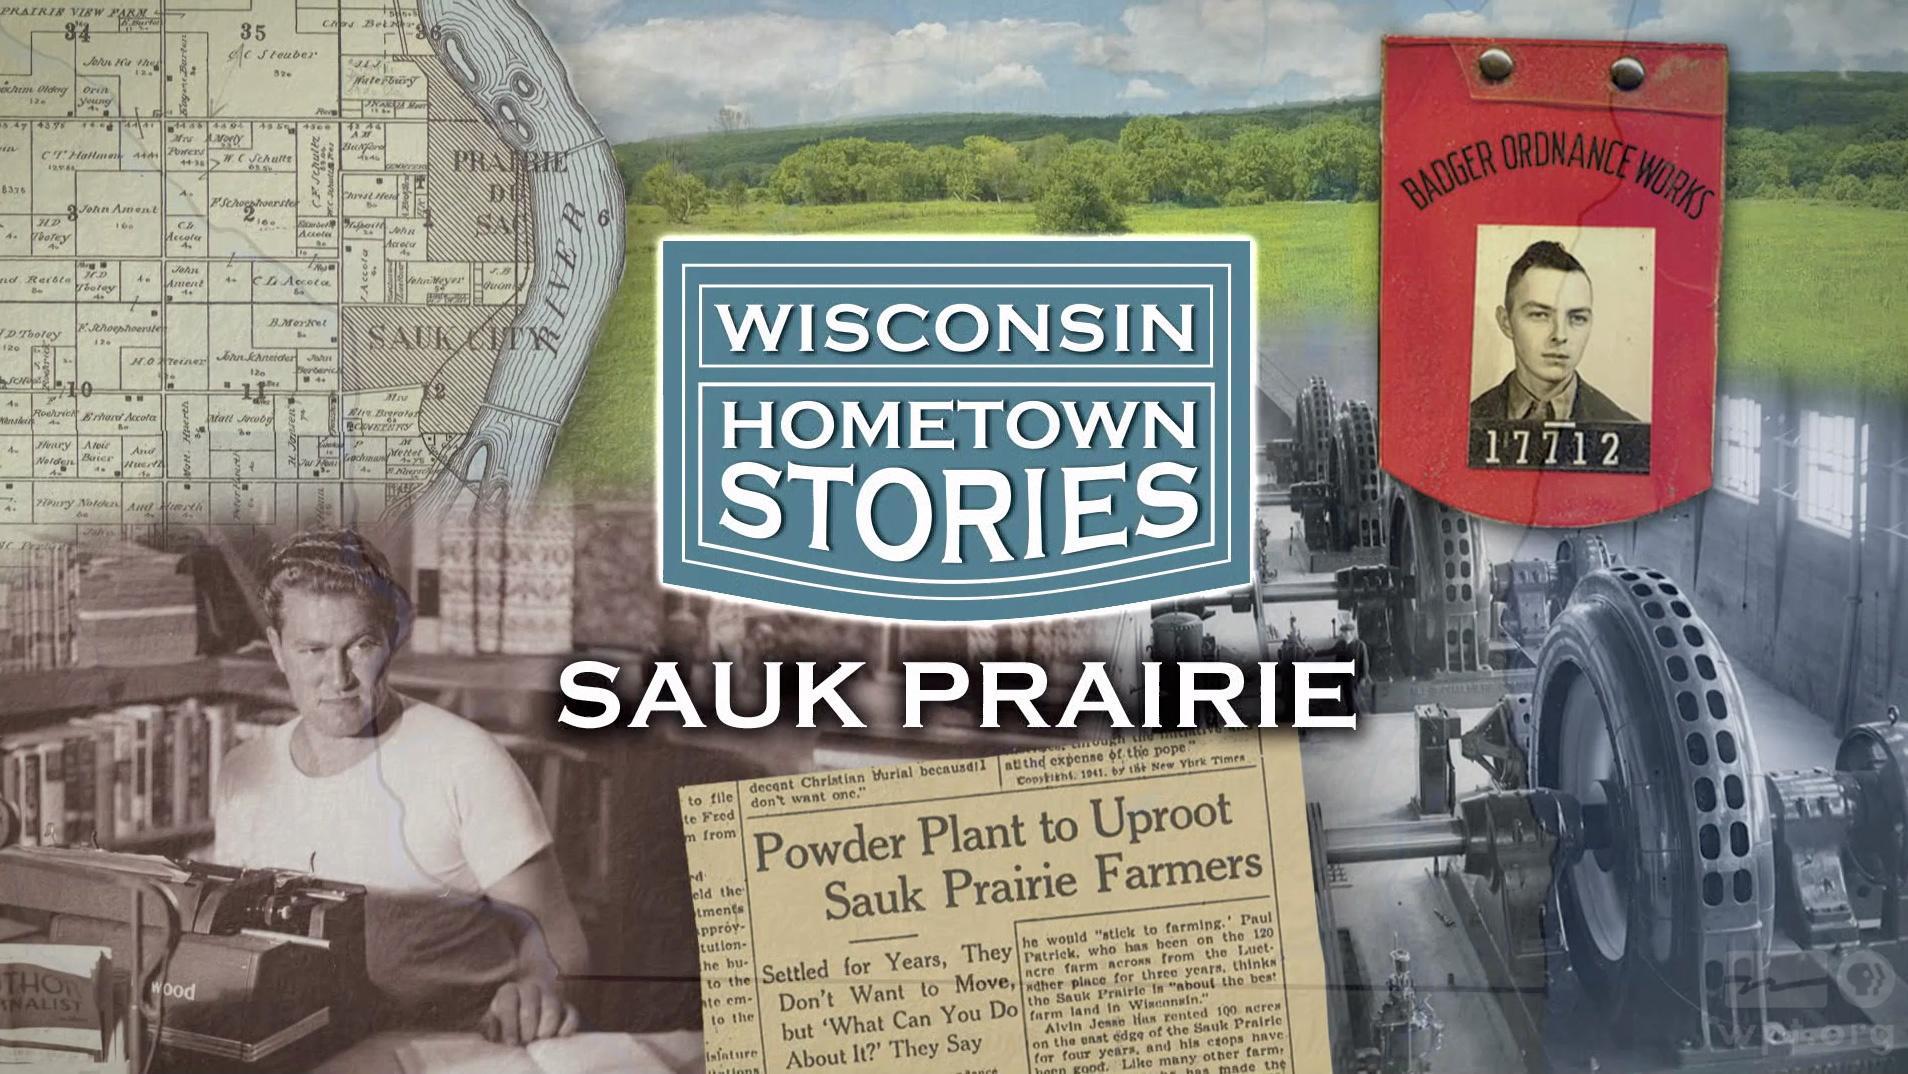 Wisconsin Hometown Stories: Sauk Prairie